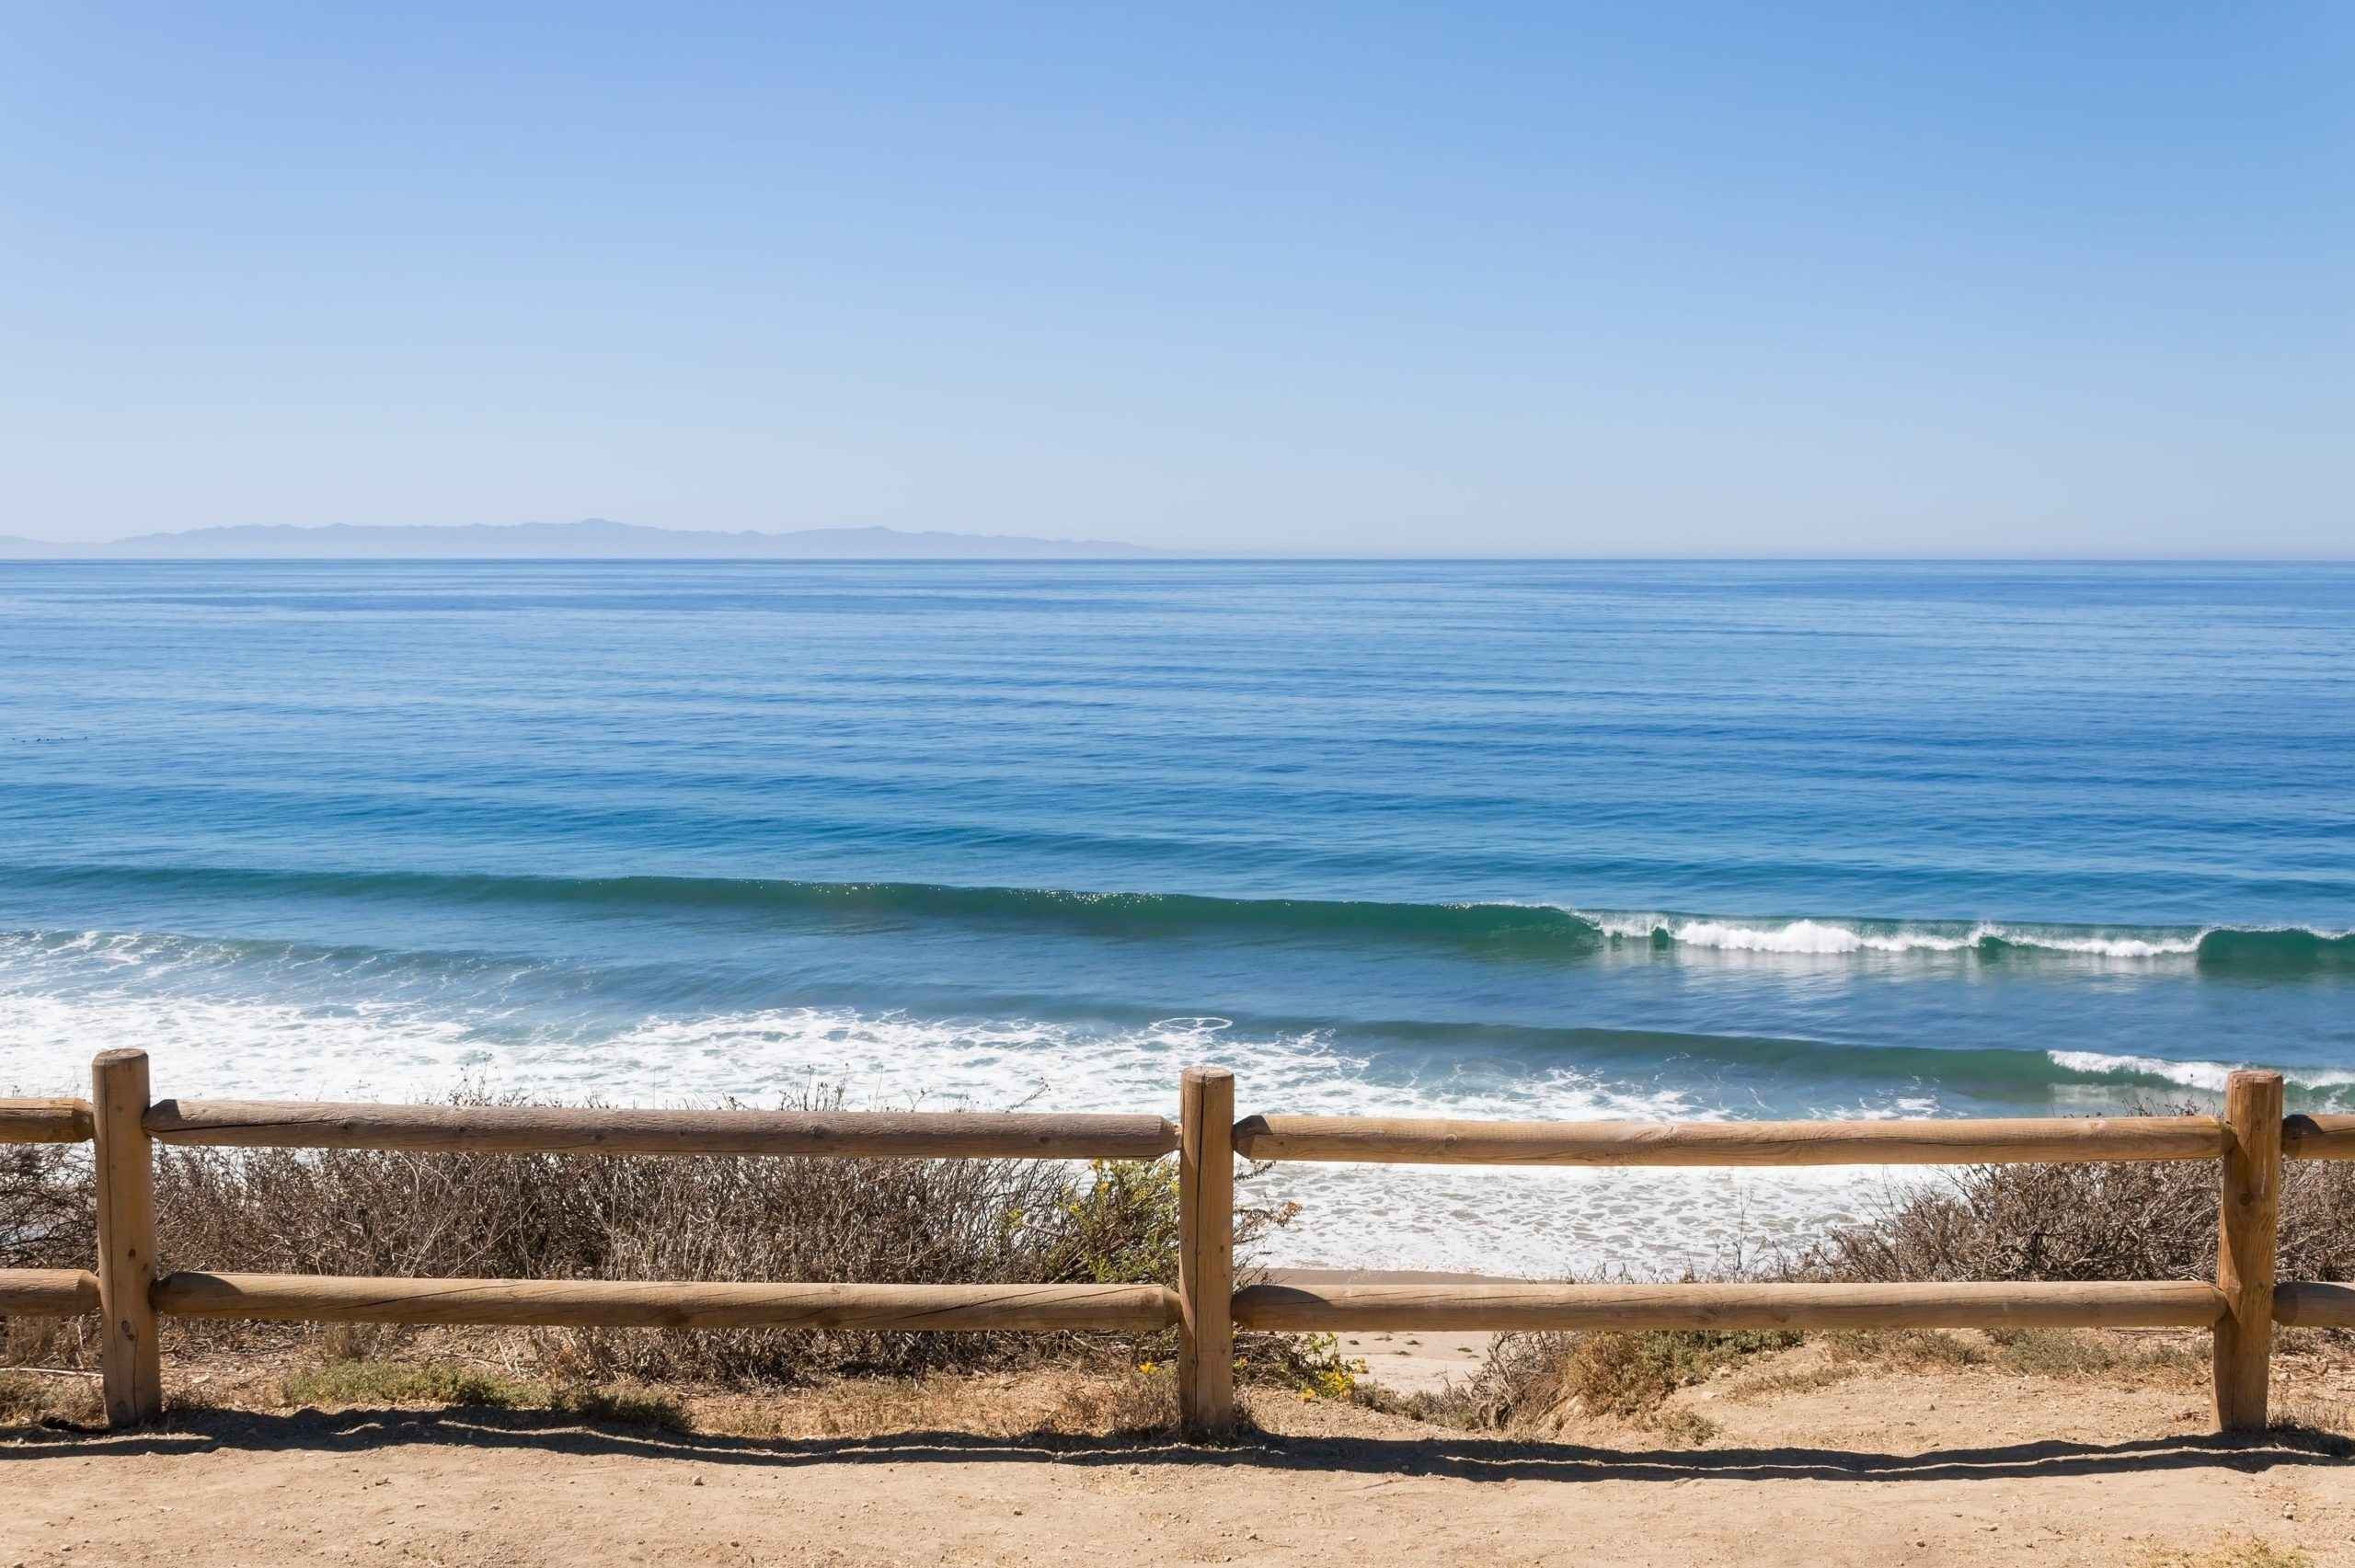 Surfing Santa Barbara - Rincon